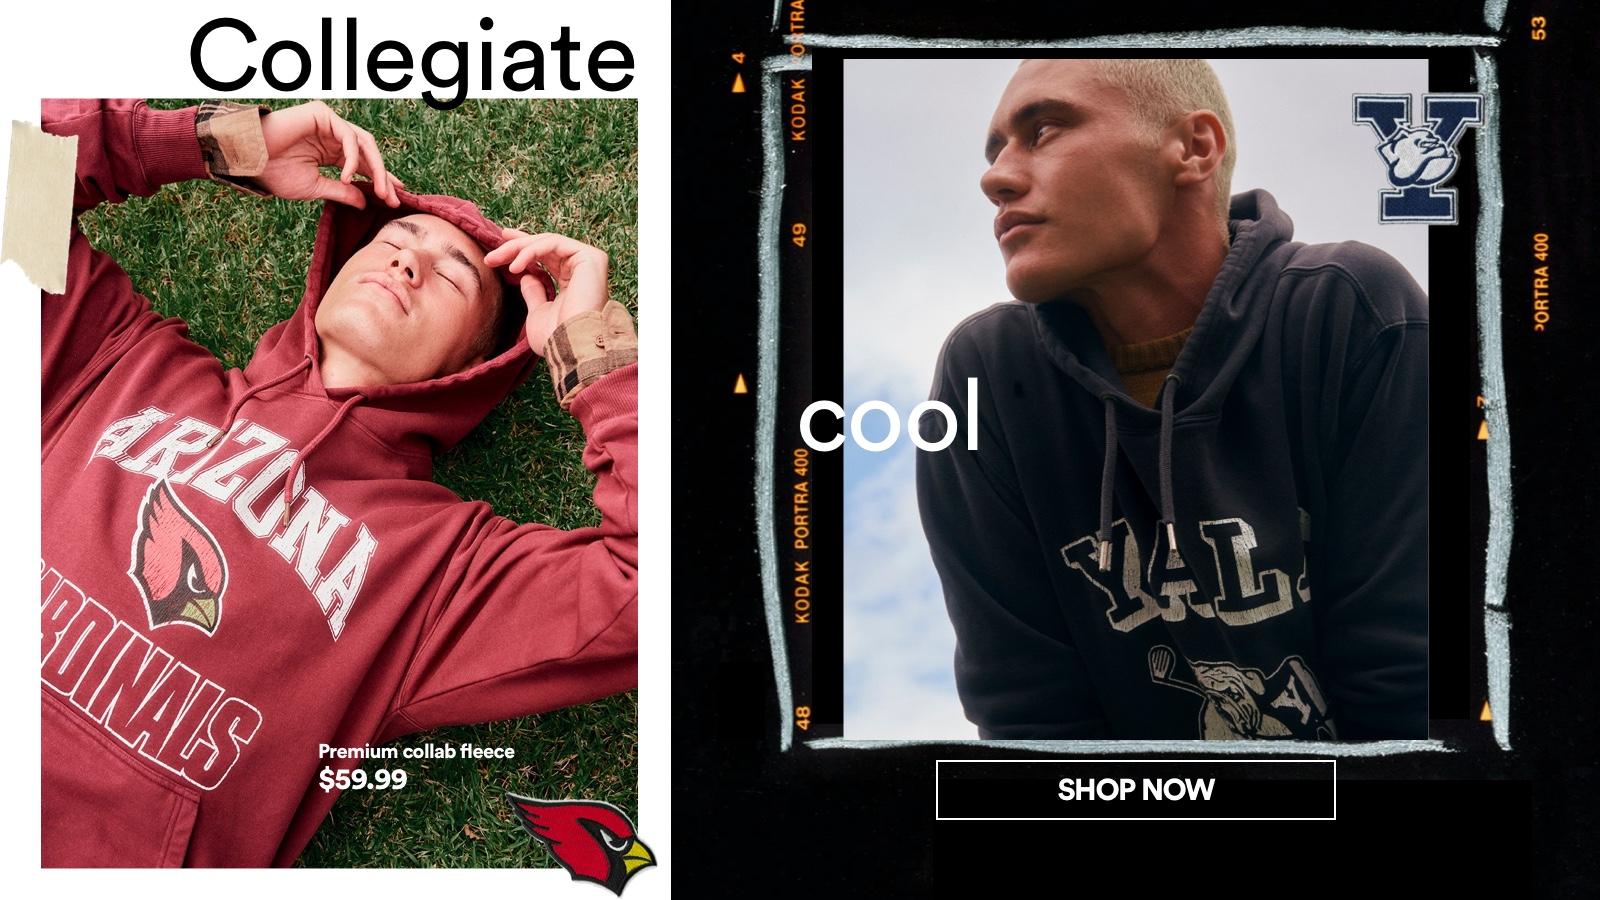 Collegiate Cool. Click to Shop.